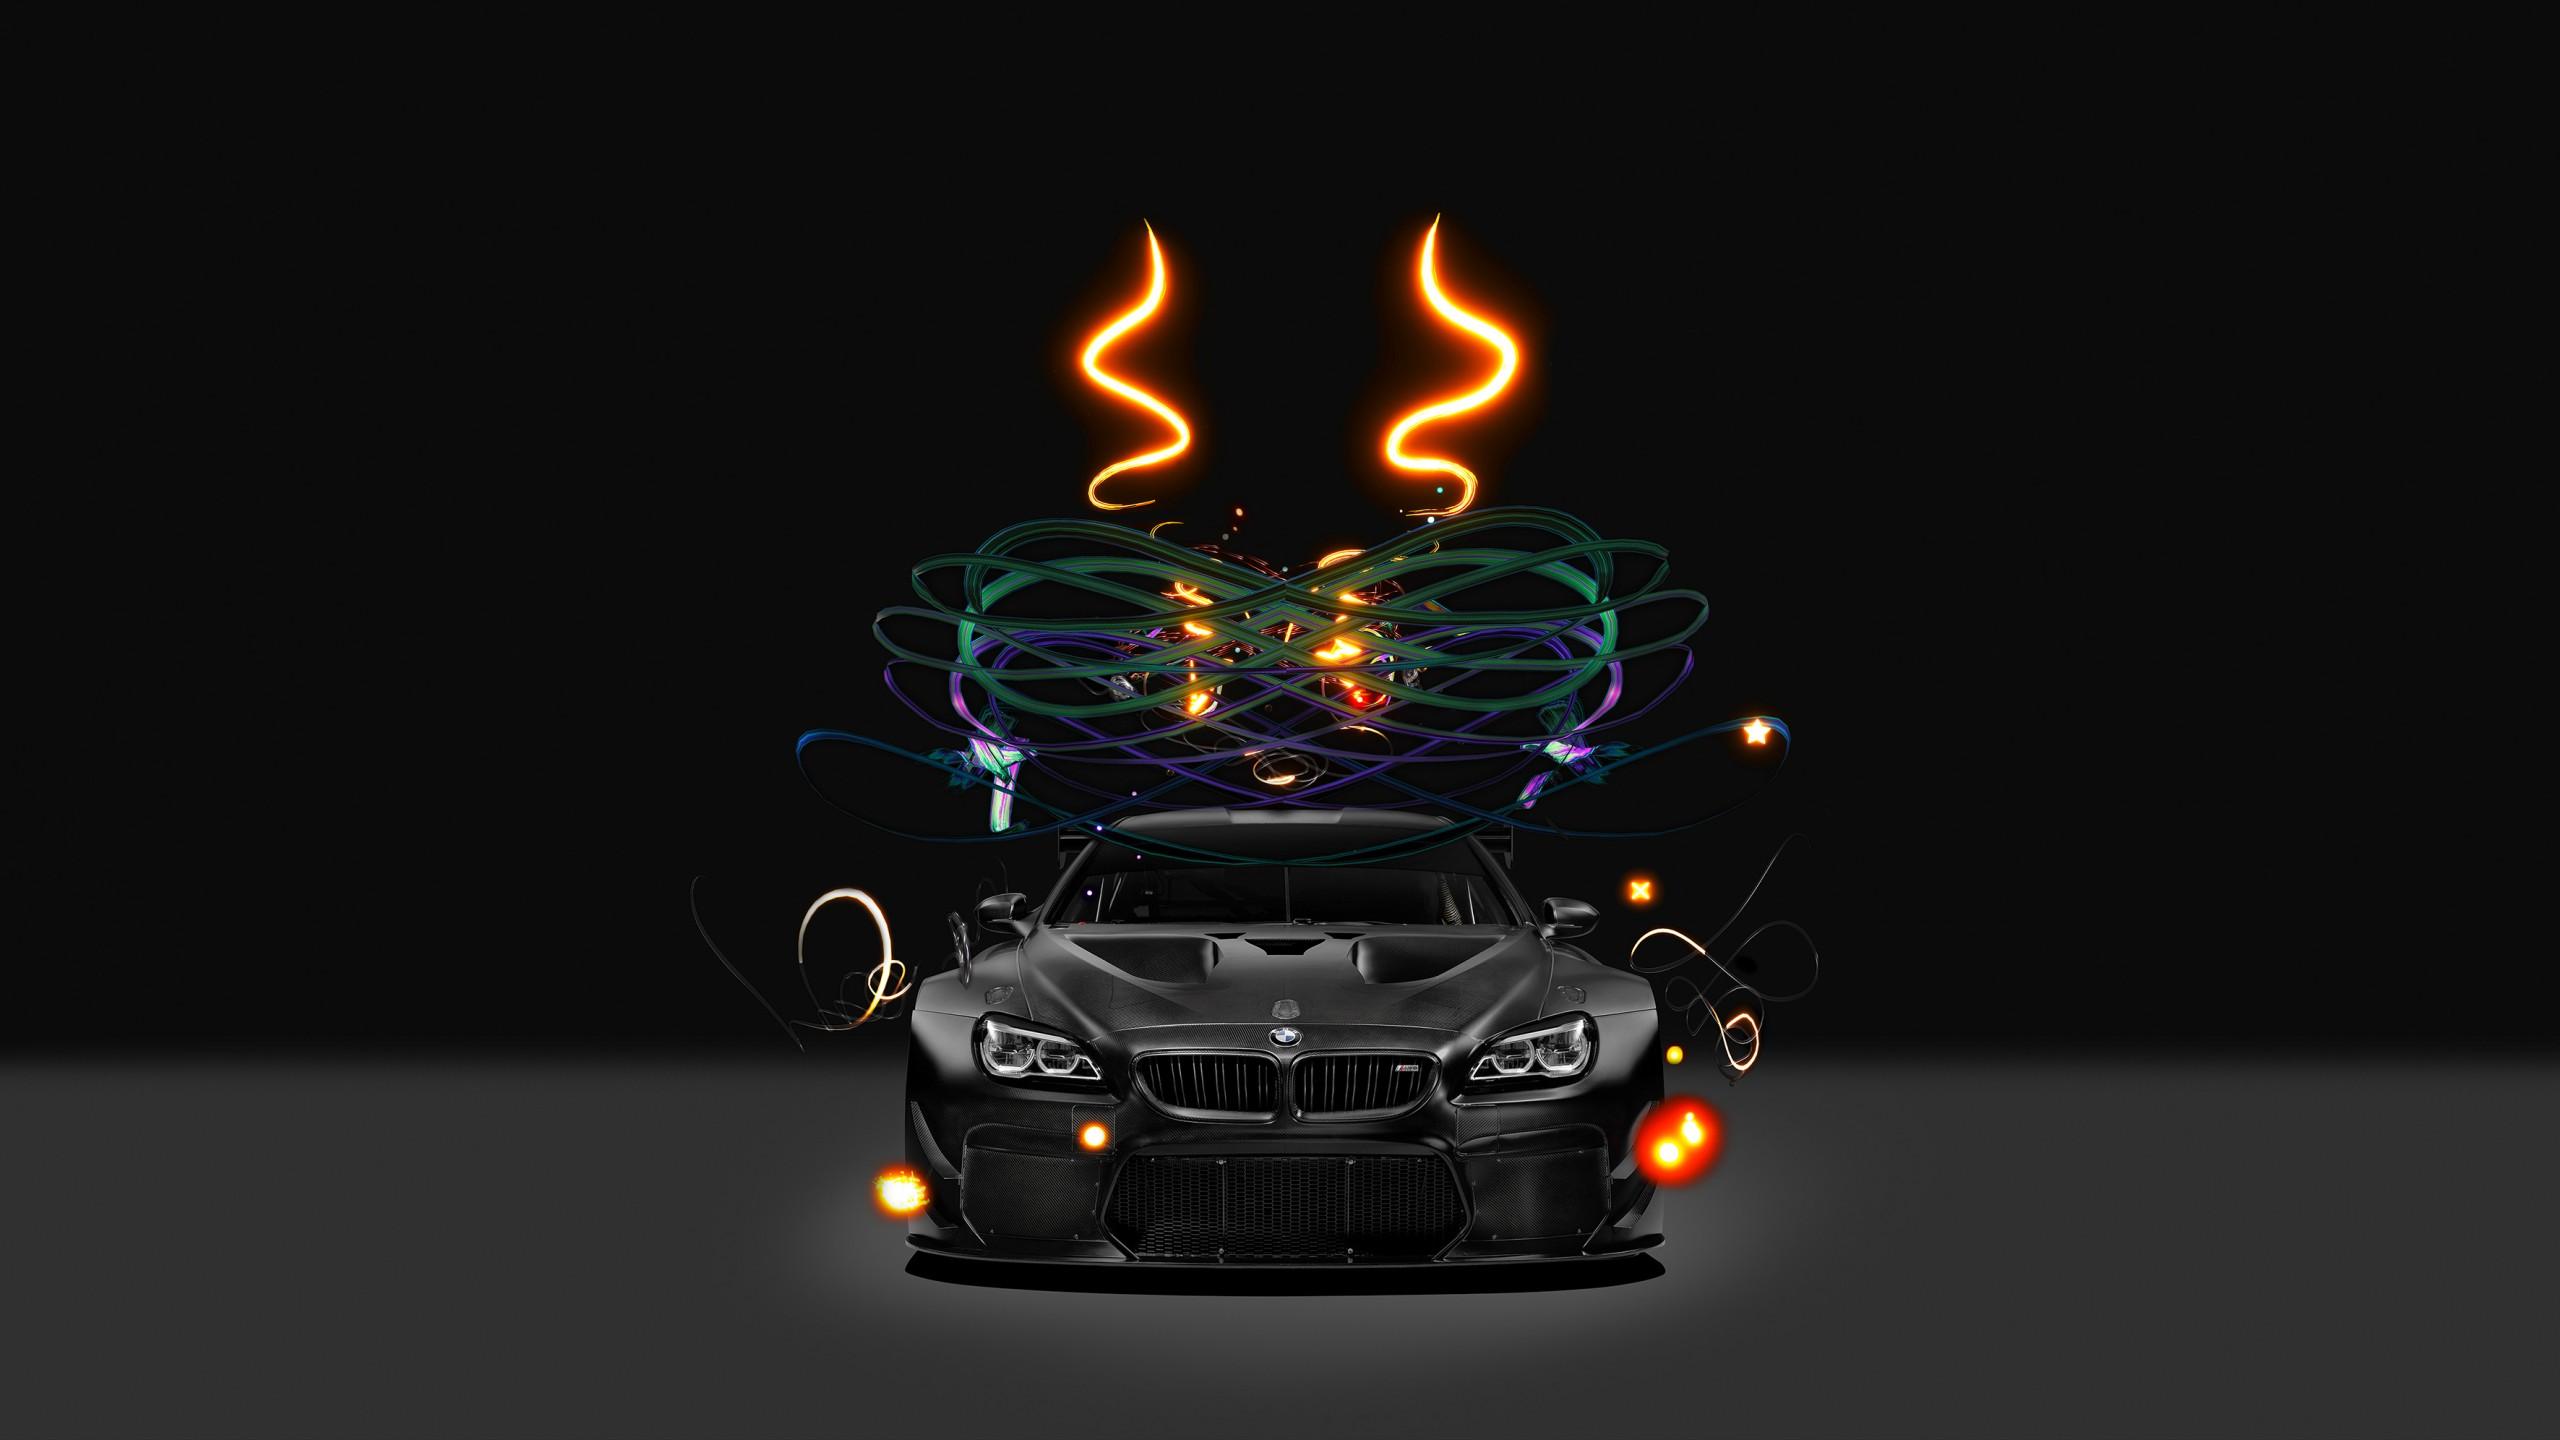 BMW M6 Gran Coupe HD Wallpaper | HD Car Wallpapers | ID #7825